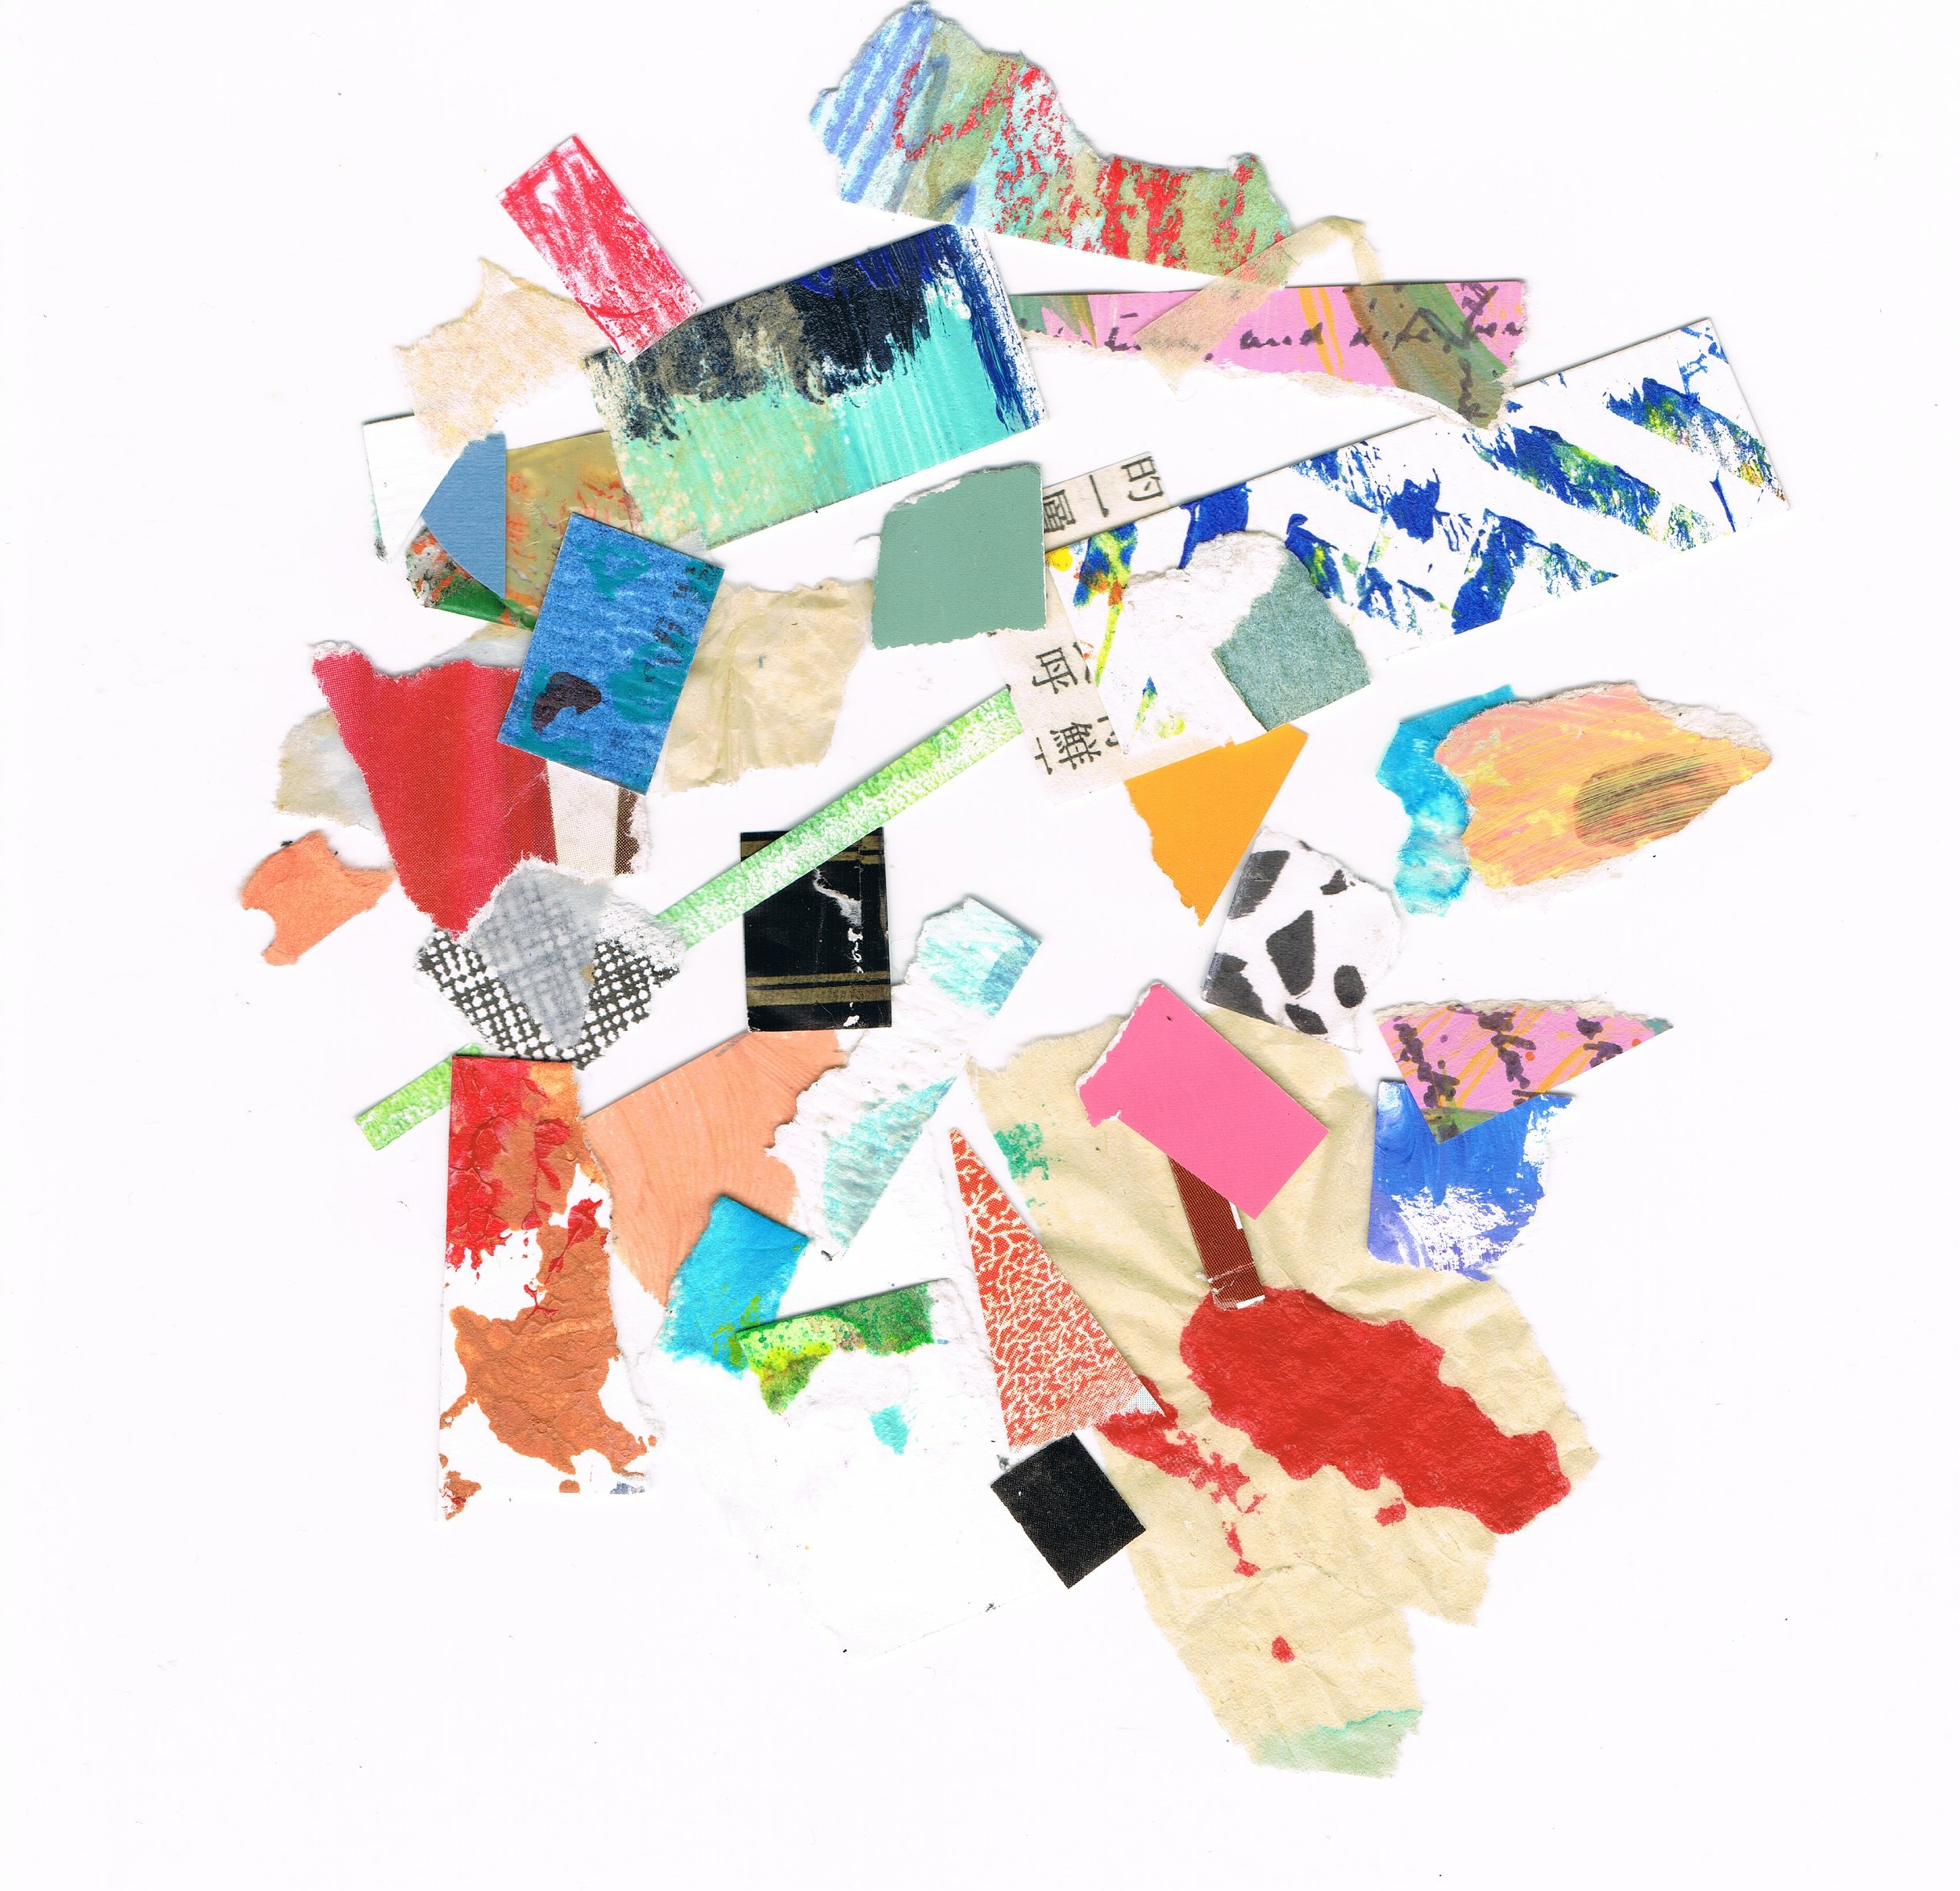 Collage tidbits studio-mlc.com